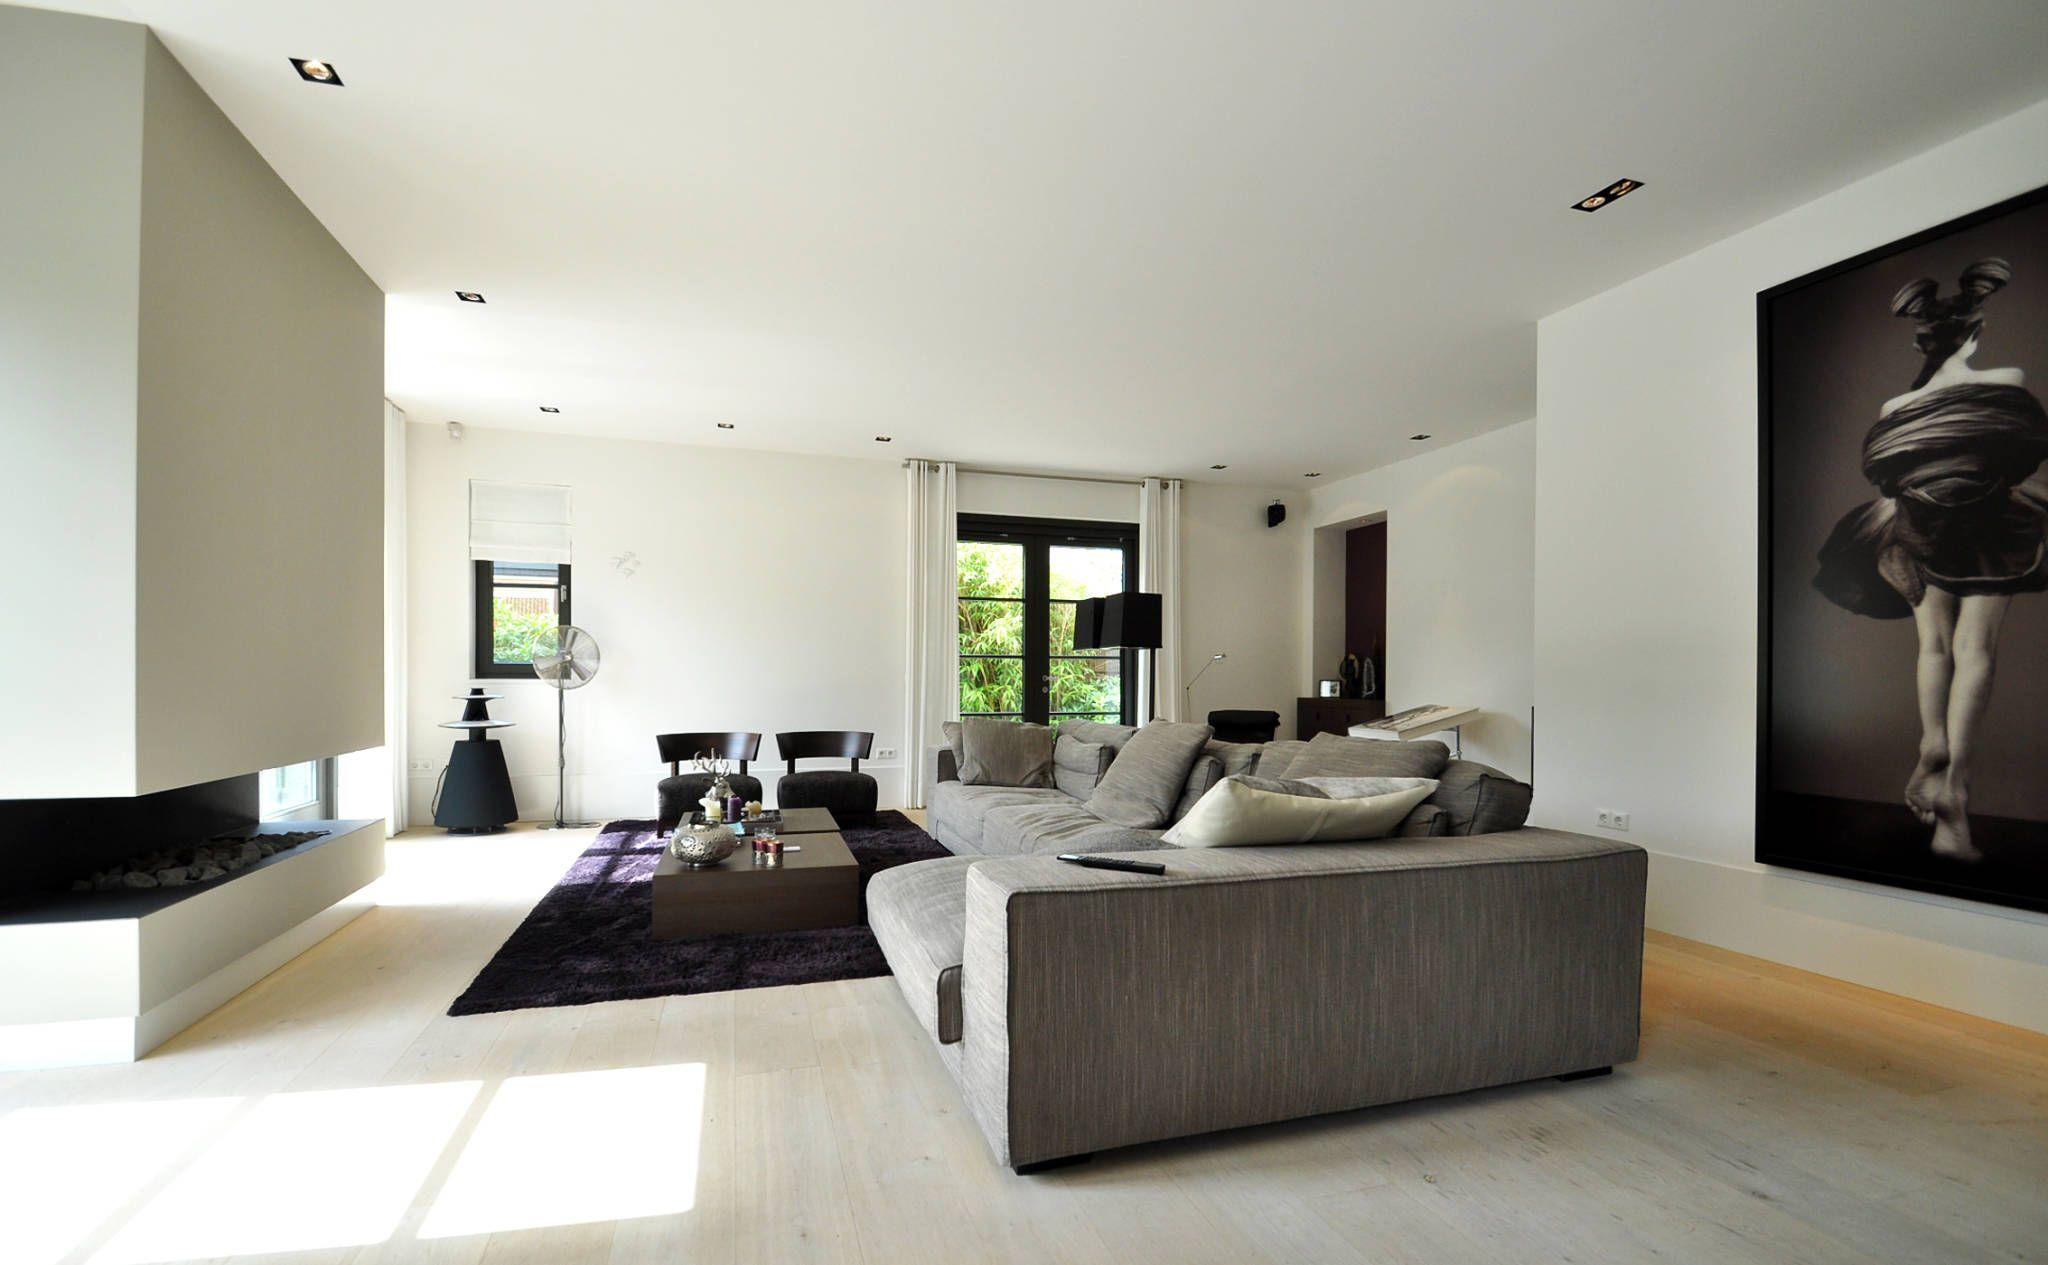 Foto s van een moderne woonkamer interieur woonkamer for Interieur woonkamer modern